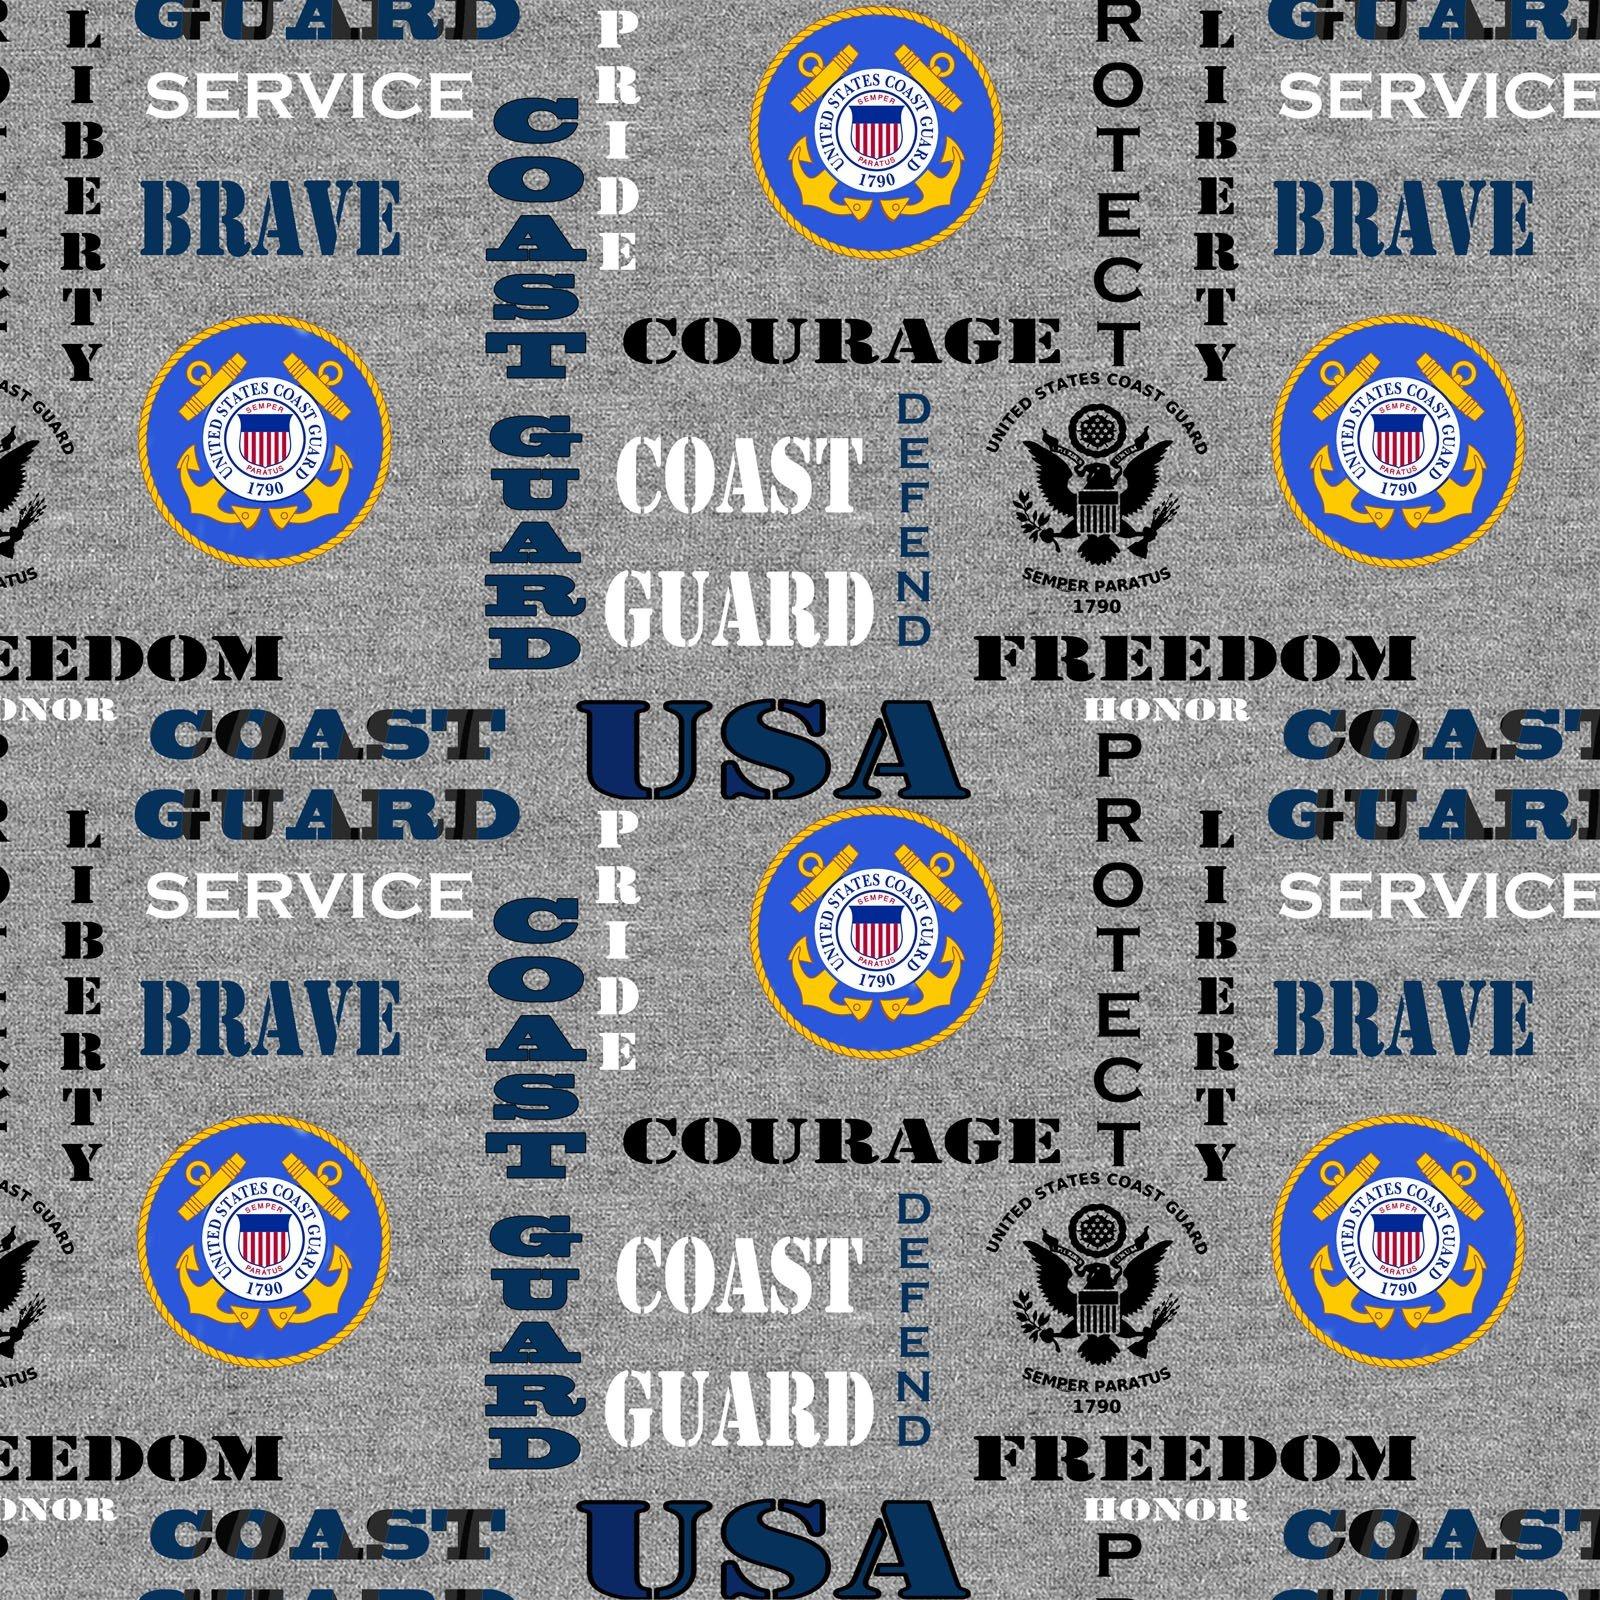 American Military  Coast Guard Terminology